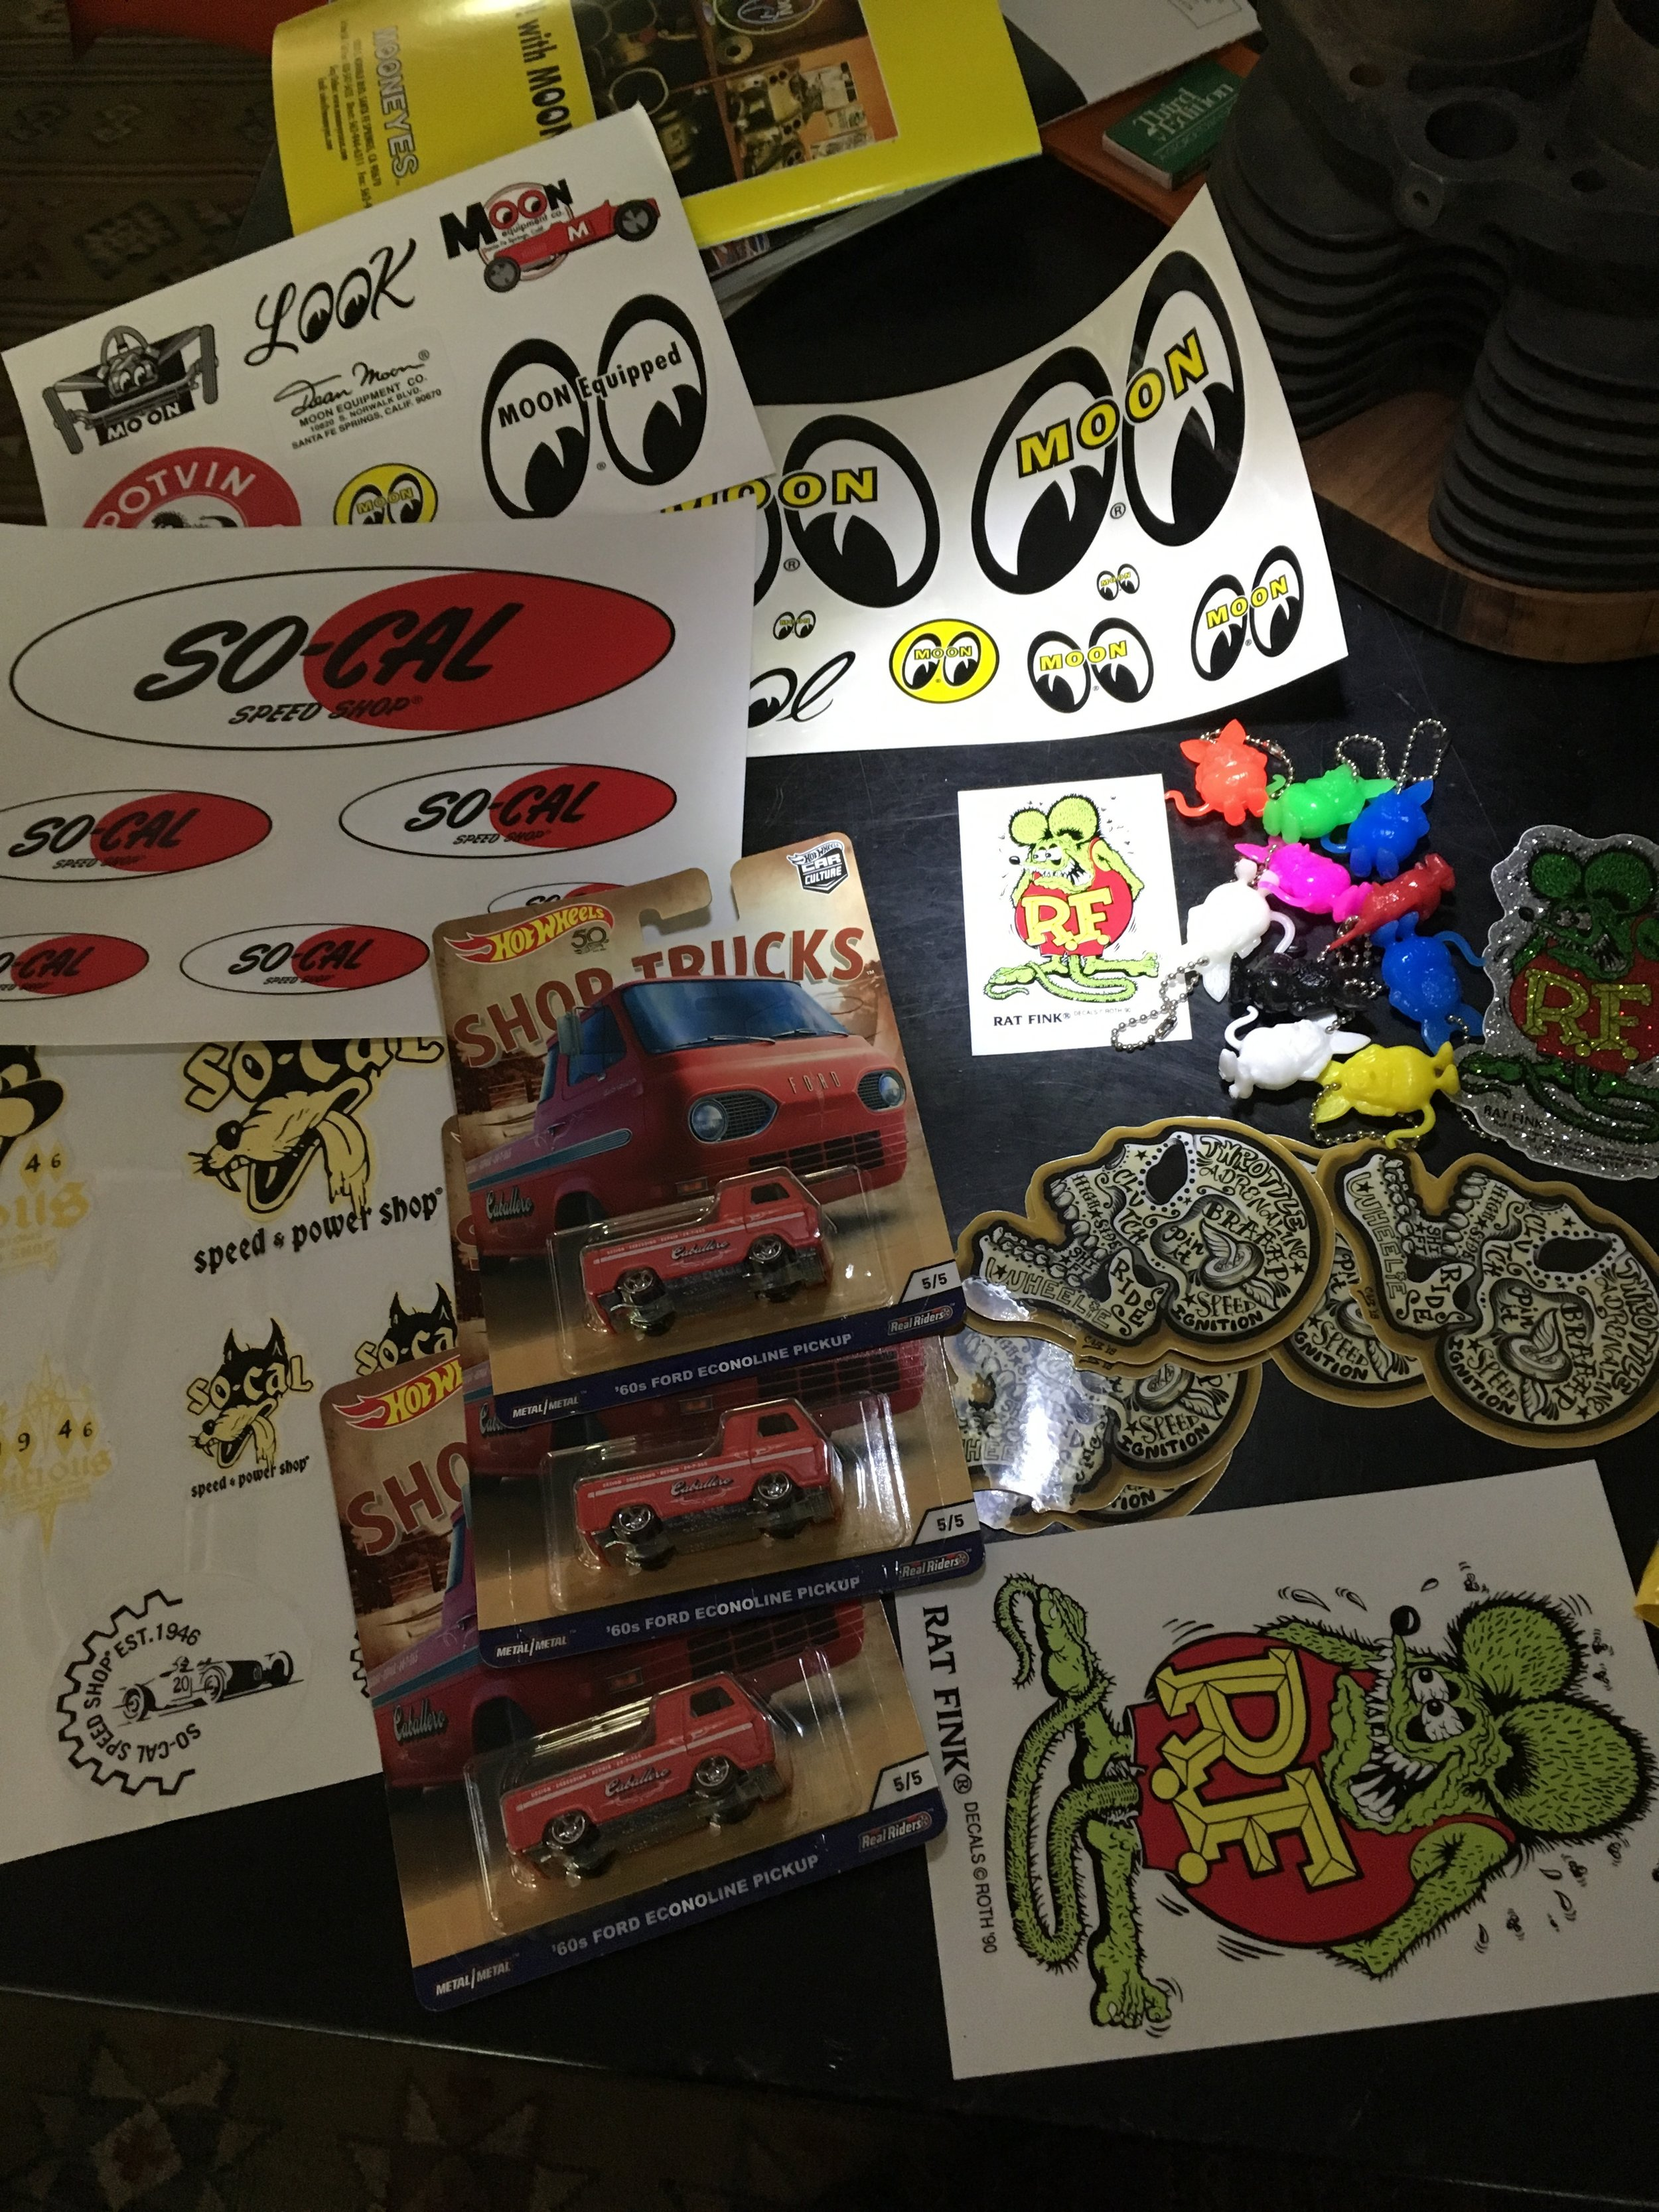 Rat Fink, SoCal Speedshop, Moon Racing, and Steve's skull stickers.